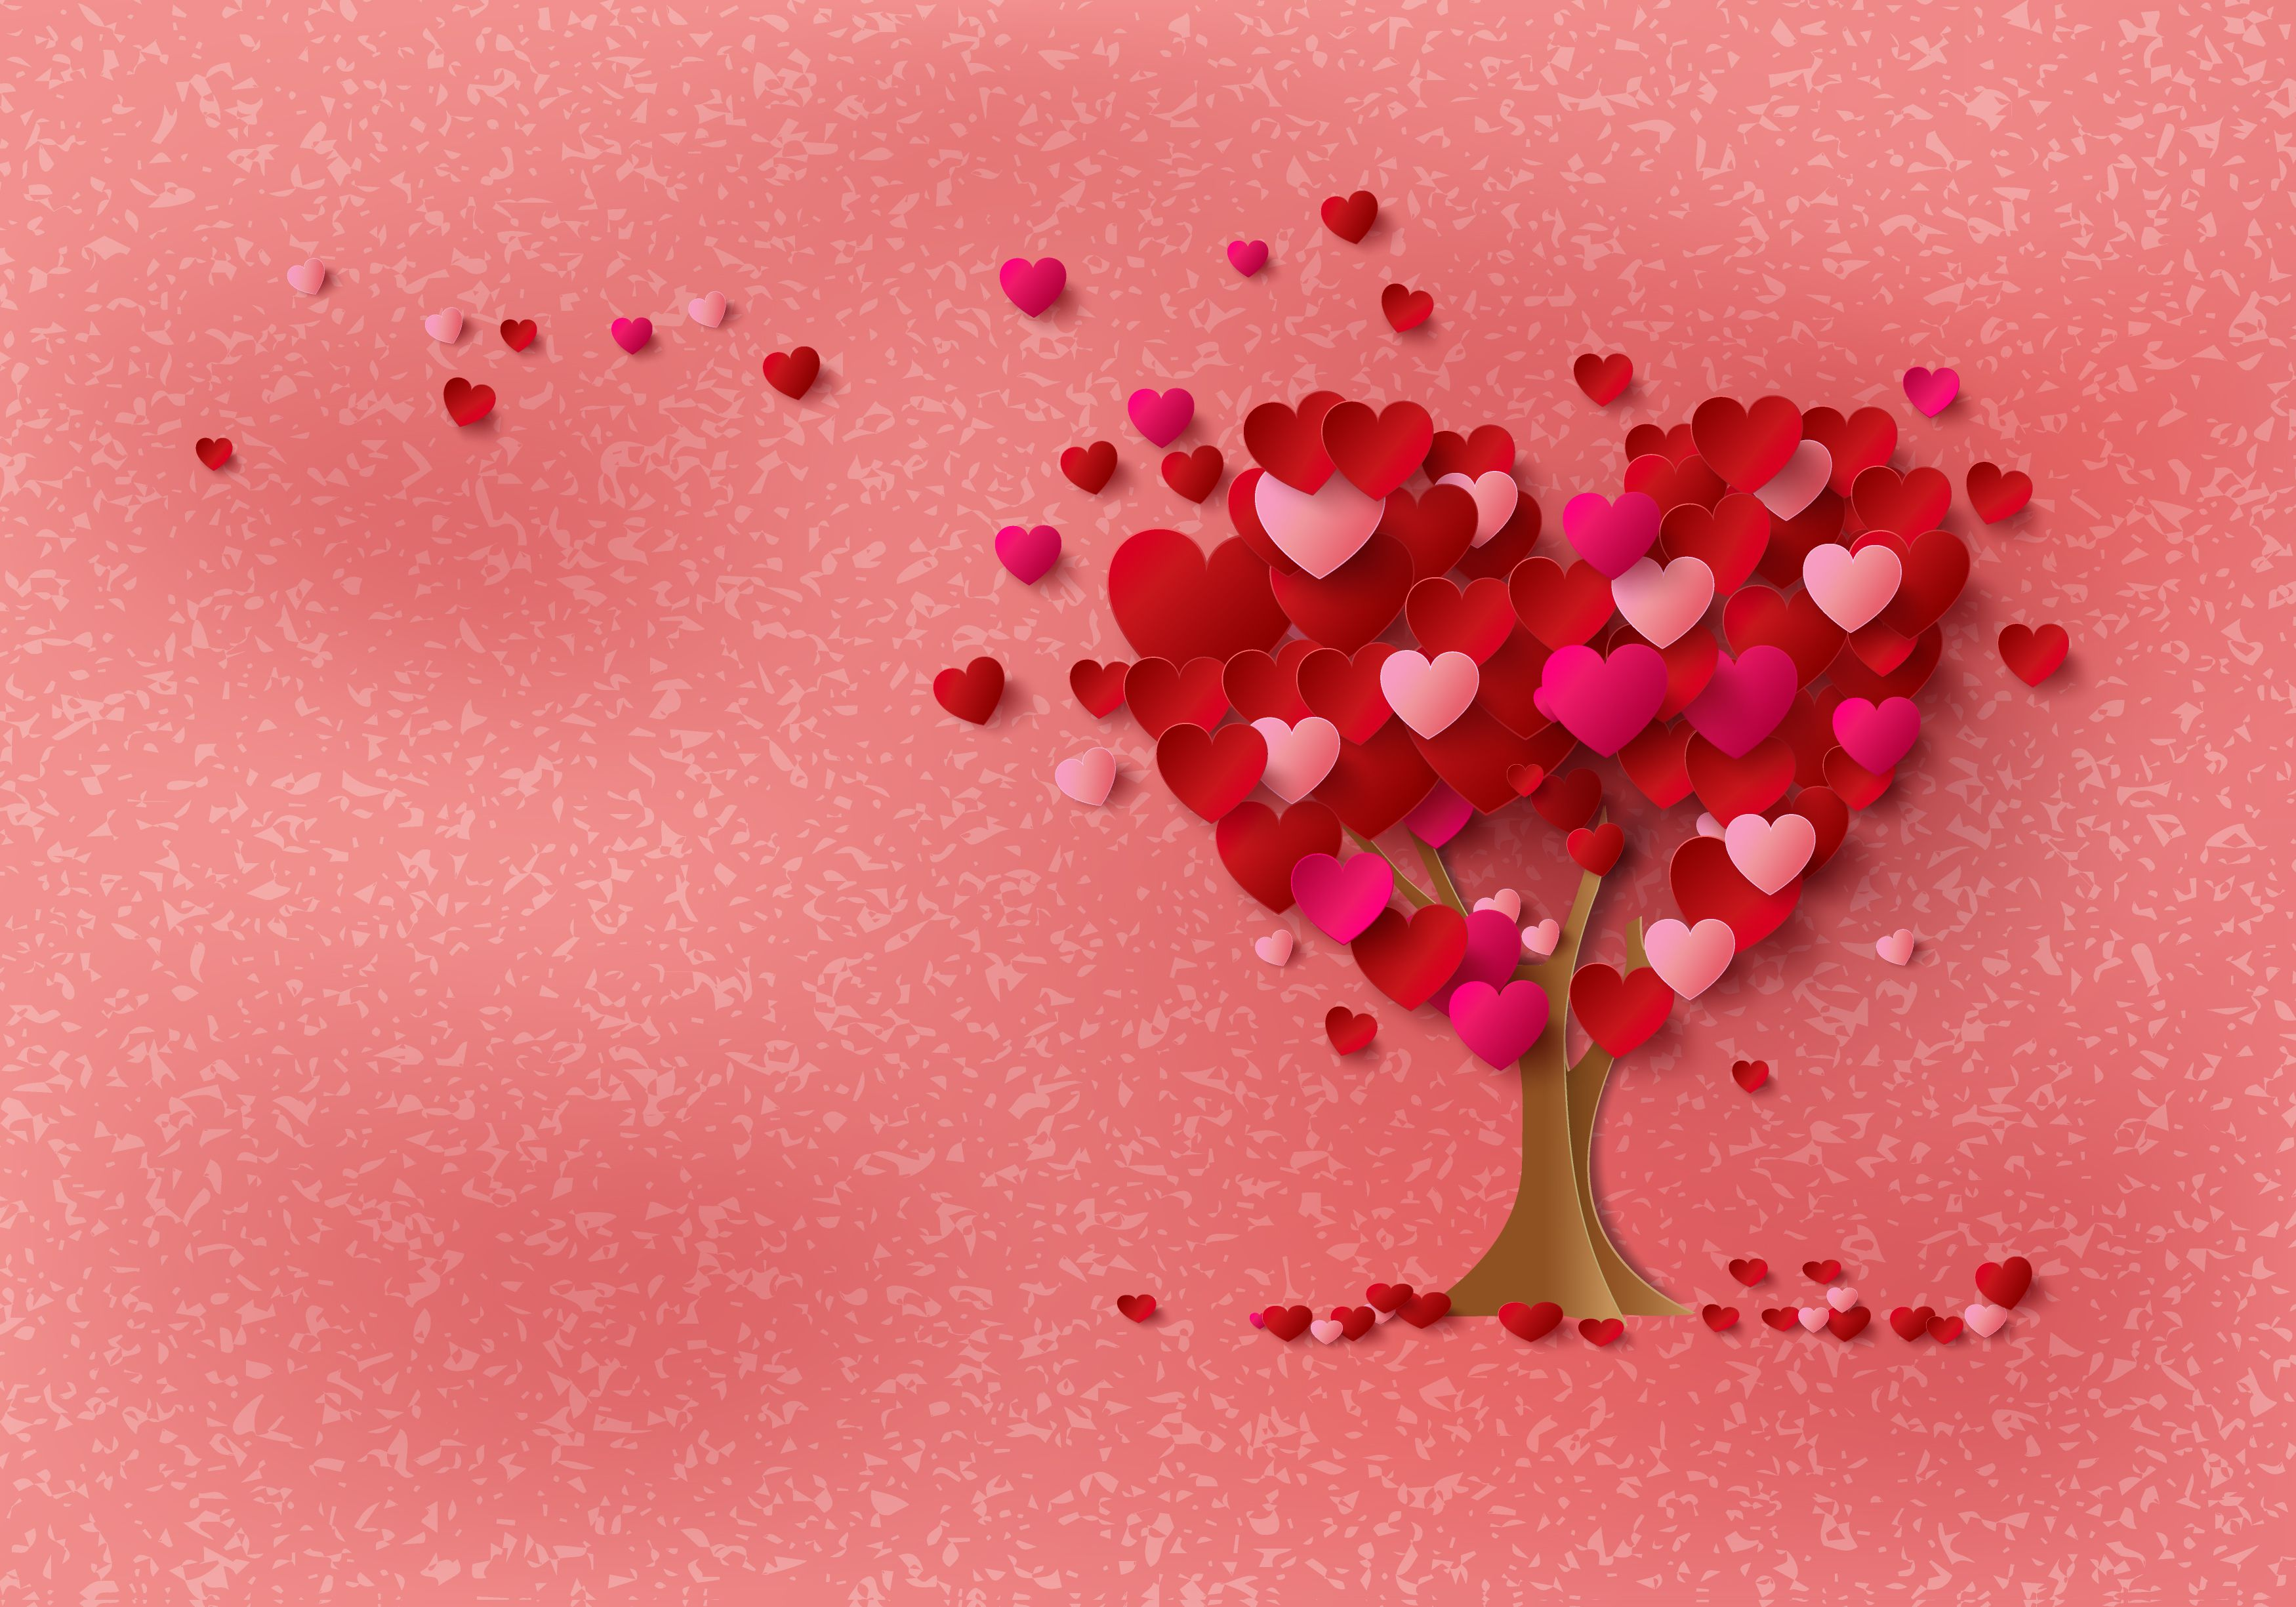 Fond Ecran Coeur D Amour